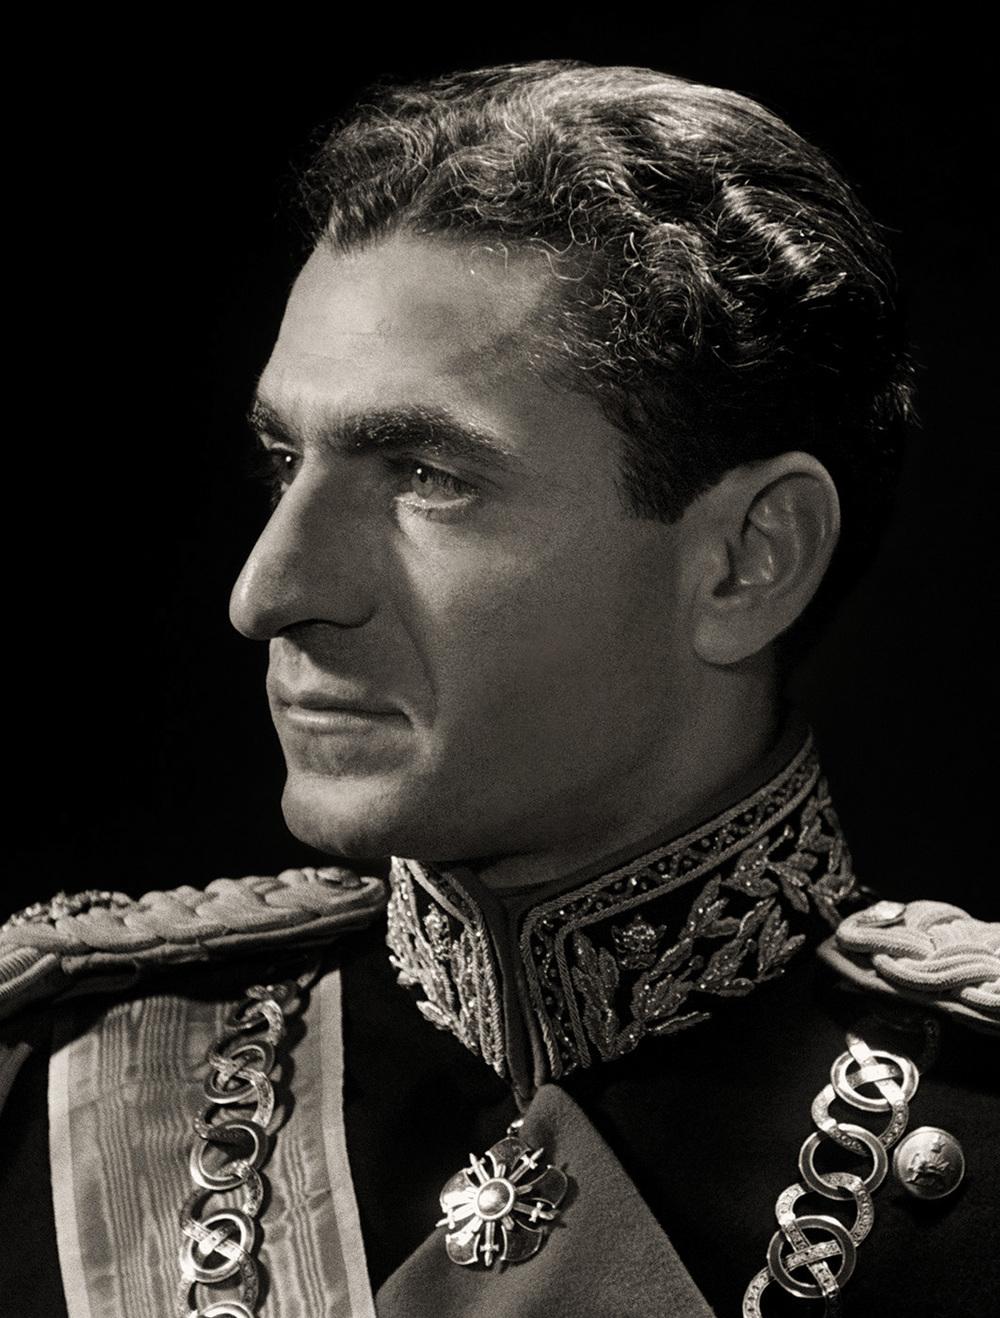 M. Reza Pahlavi, Shah of Iran, c. 1949